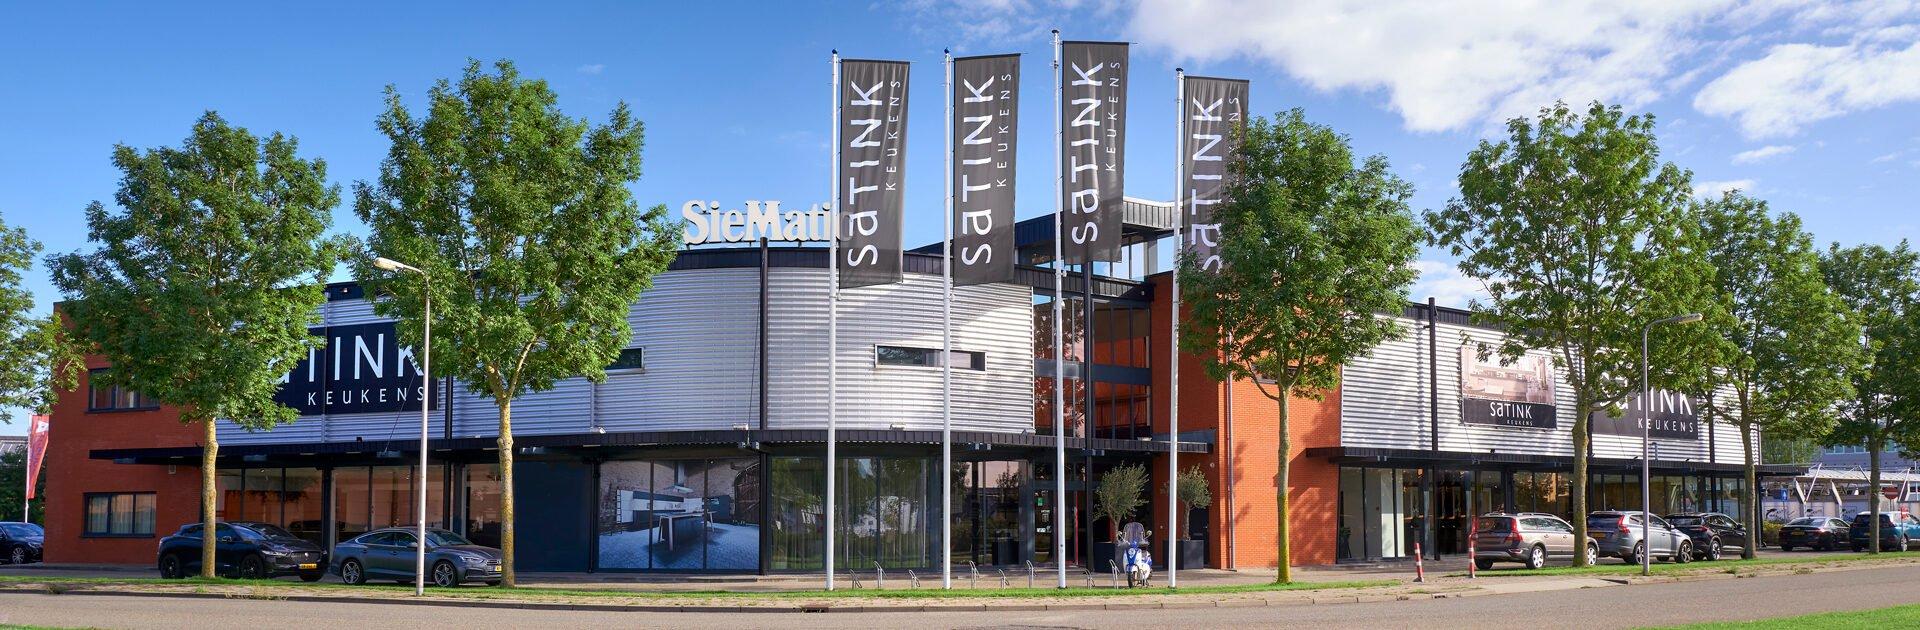 Satink Keukens pand Zwolle 2021